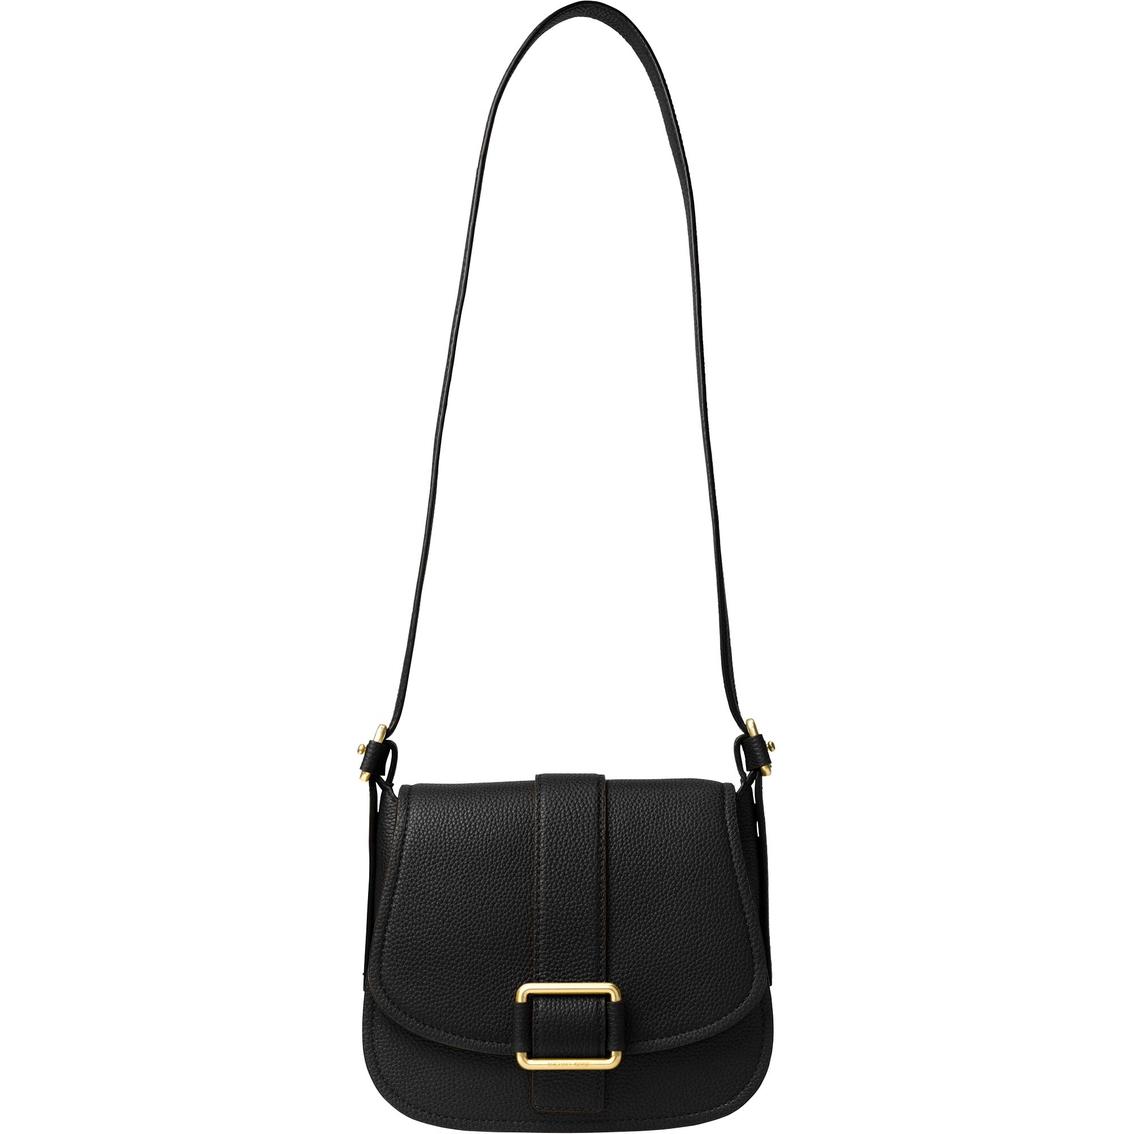 b7942382 Michael Kors Maxine Large Saddle Bag   Handbags   Shop The Exchange